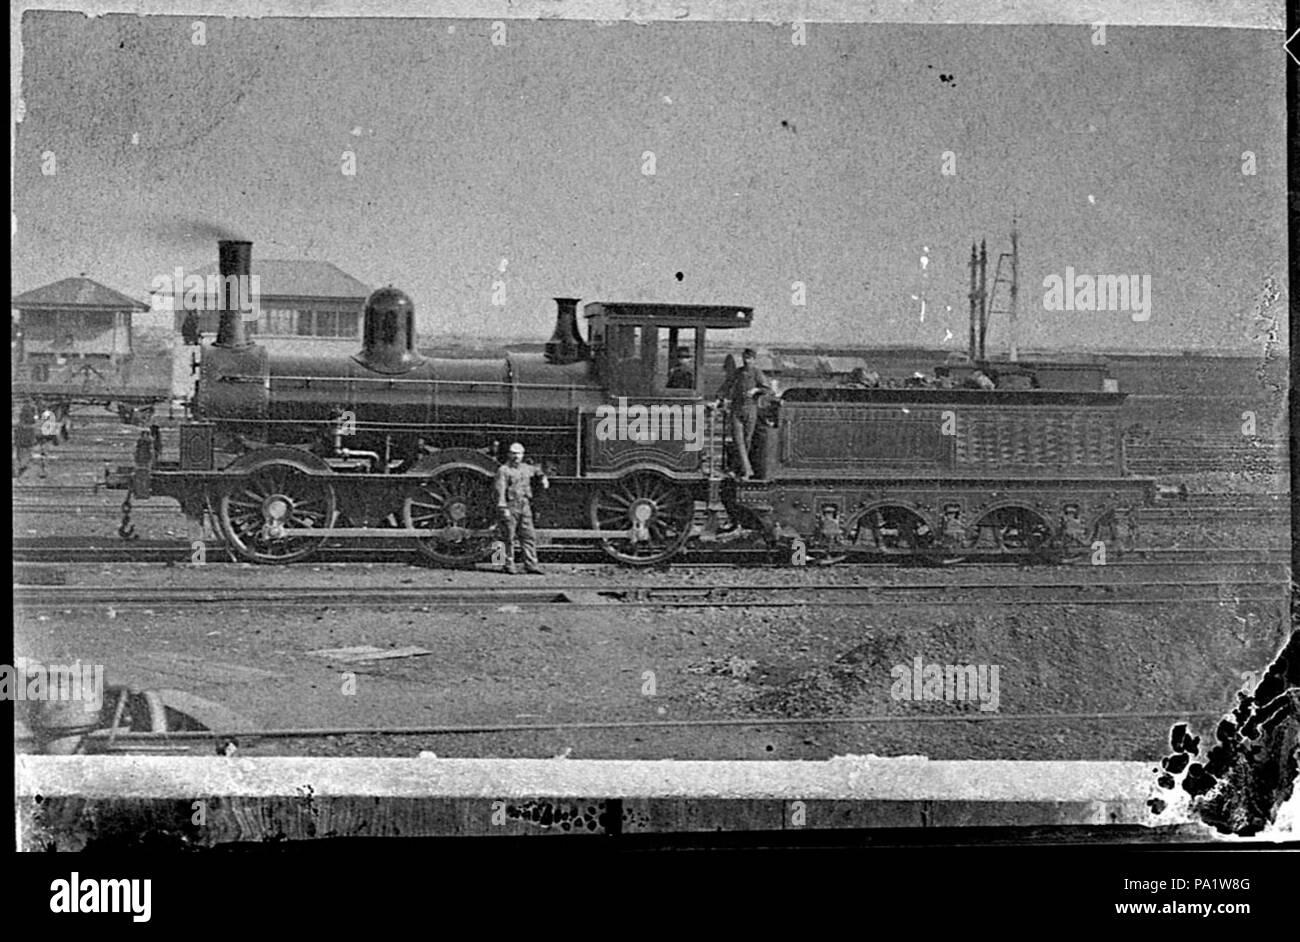 253 SLNSW 28750 Victorian Railways Beyer Peacock Q class steam locomotive ca 1870 copy photograph 1940s - Stock Image